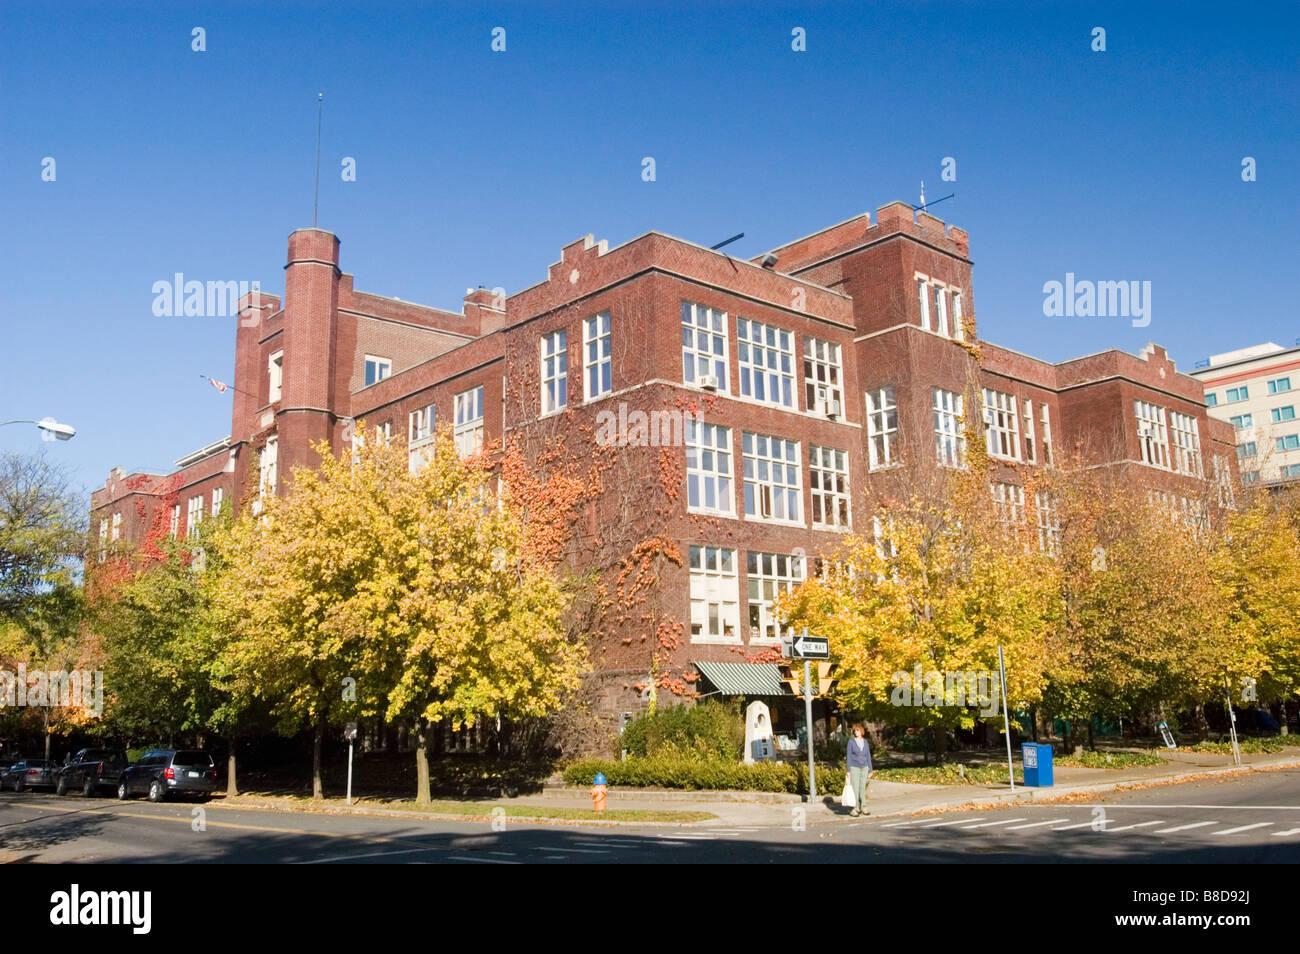 dewitt usa stock photos dewitt usa stock images alamy dewitt mall building ithaca ny usa stock image